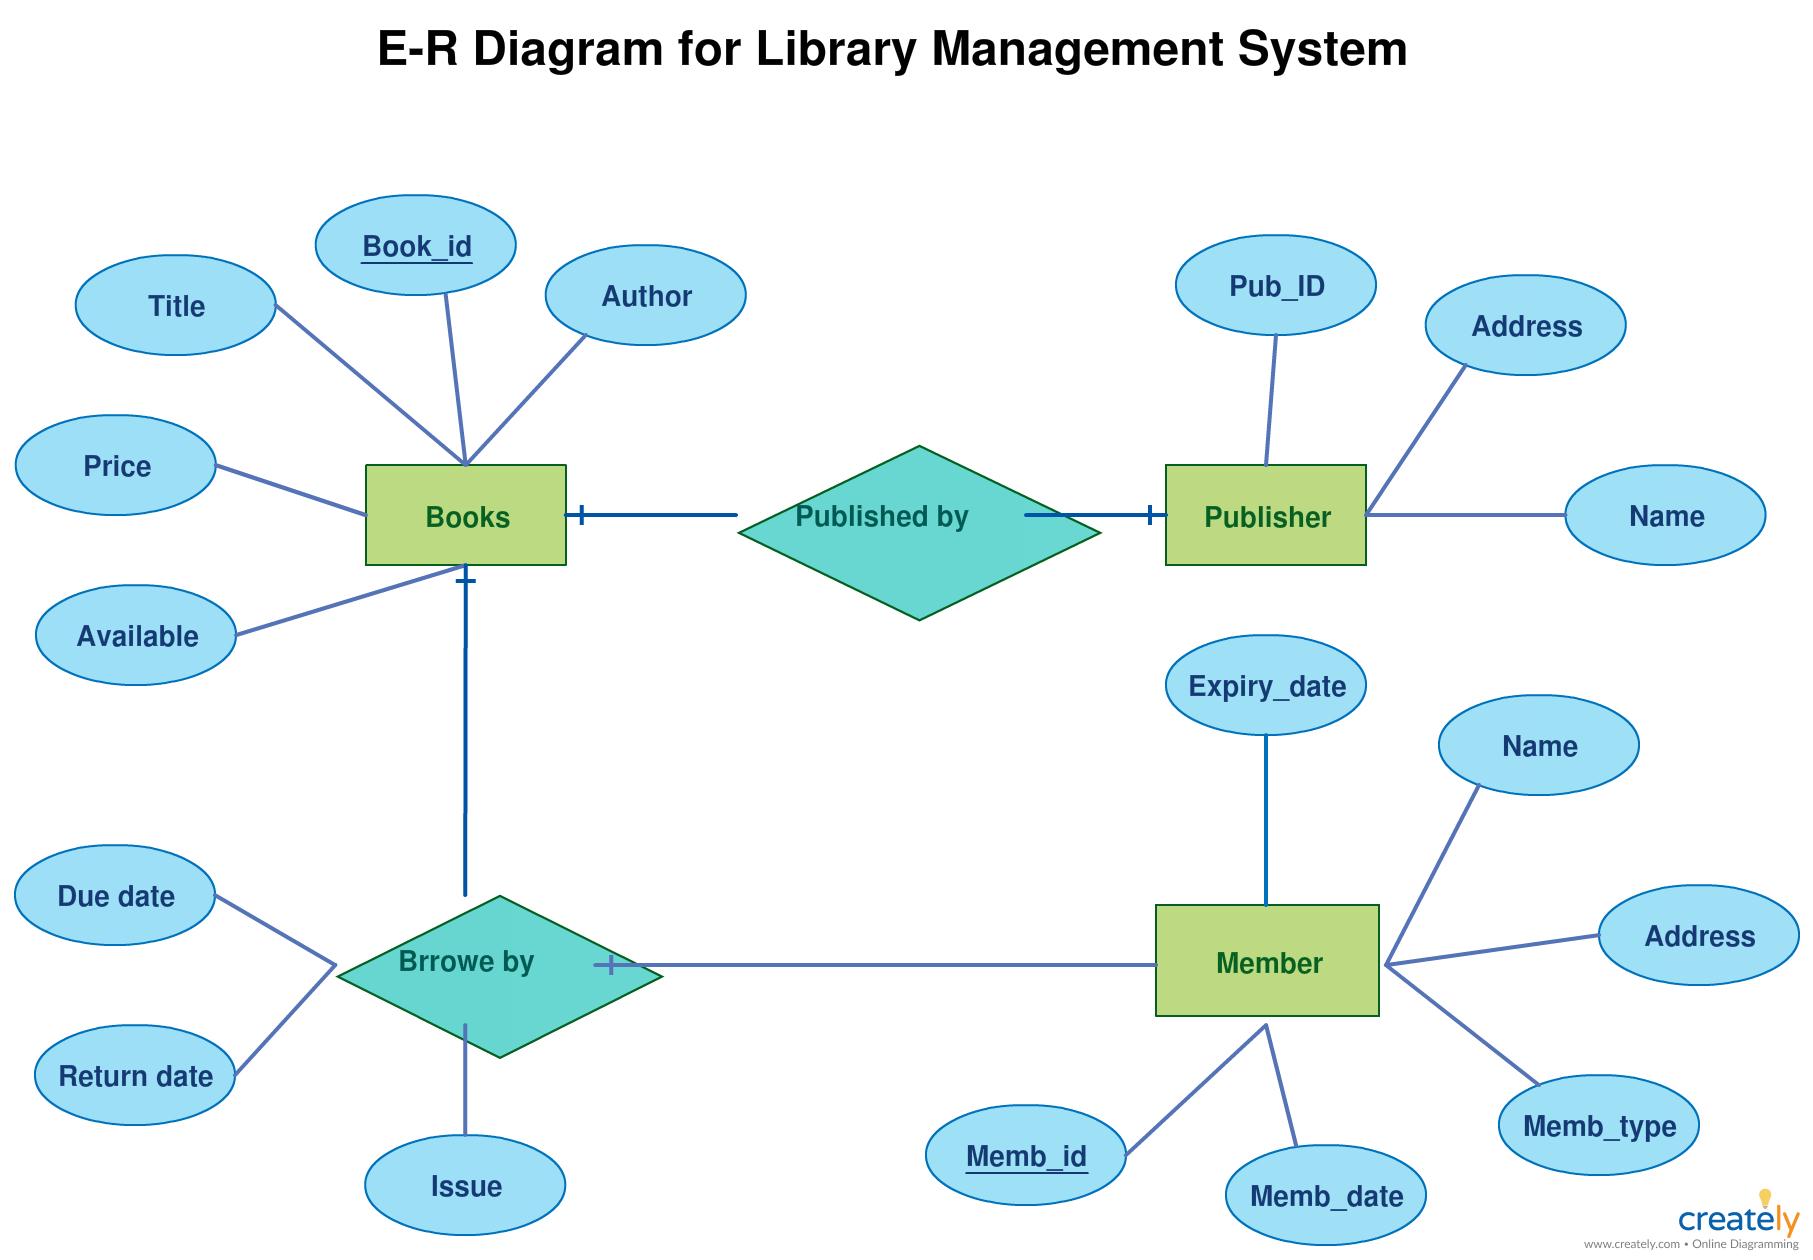 Er Diagram Tutorial | Relationship Diagram, Data Flow for An Er Diagram